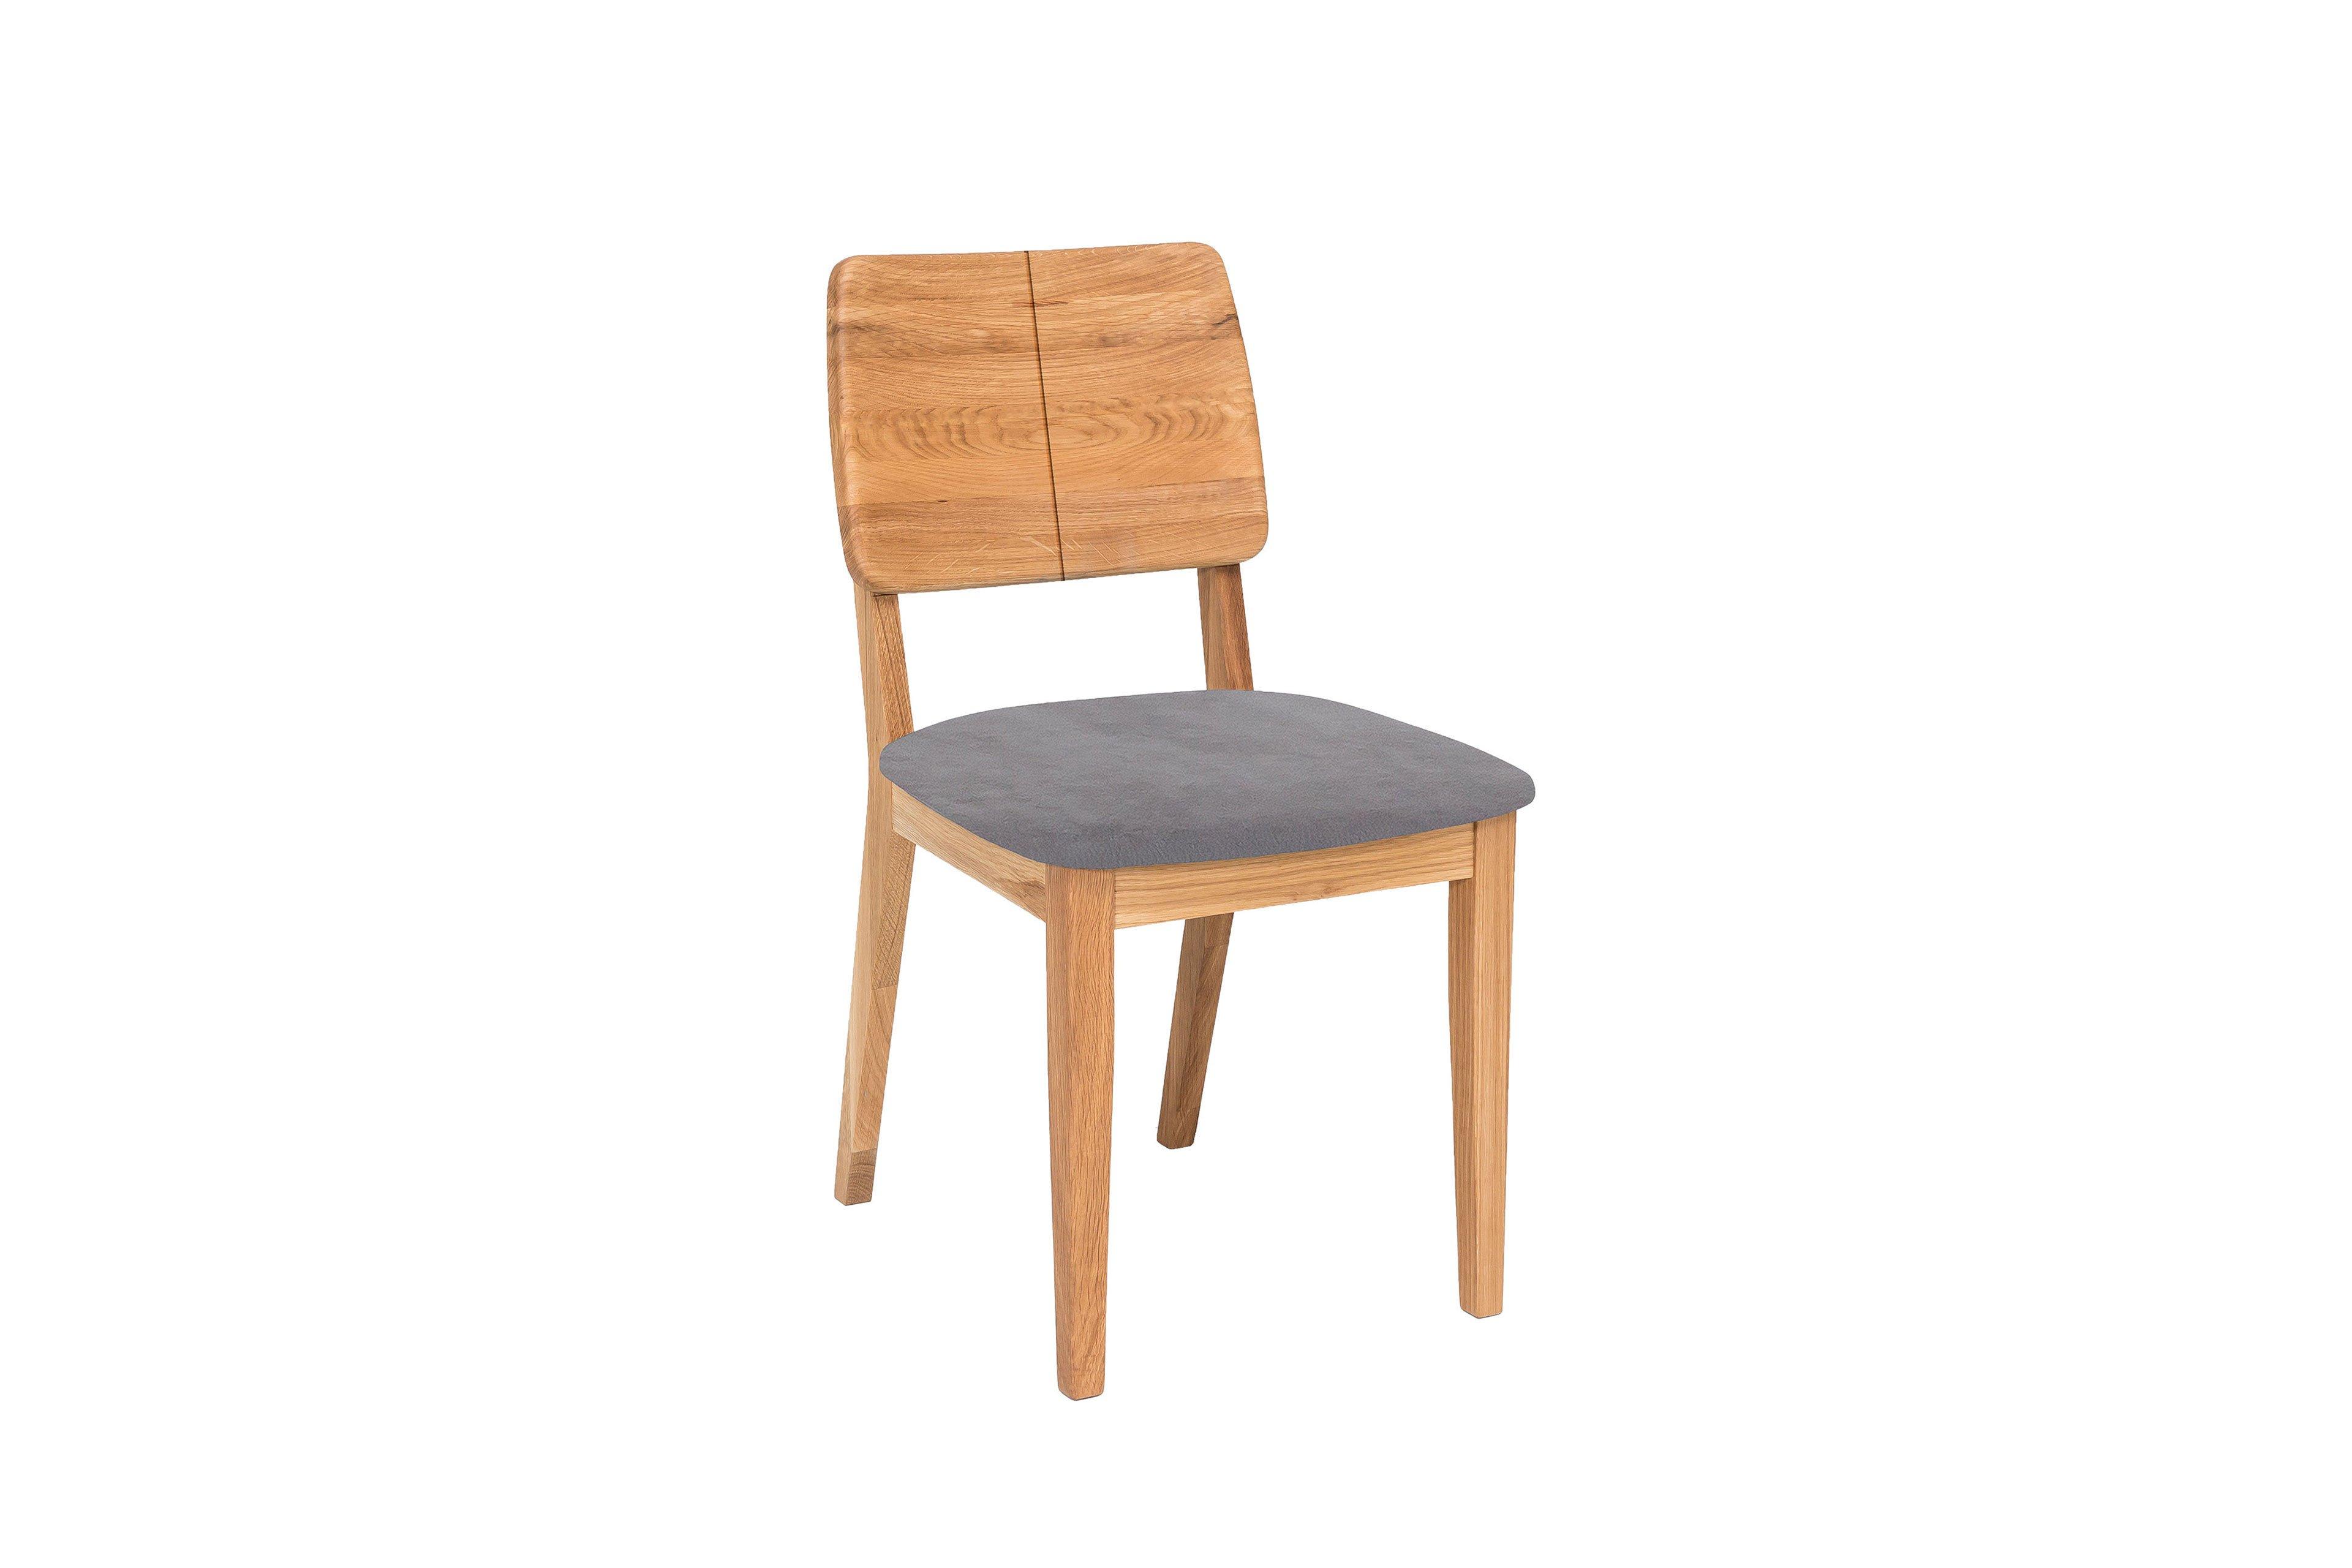 Standard Furniture Stuhl Norman 2 In Grau Mobel Letz Ihr Online Shop